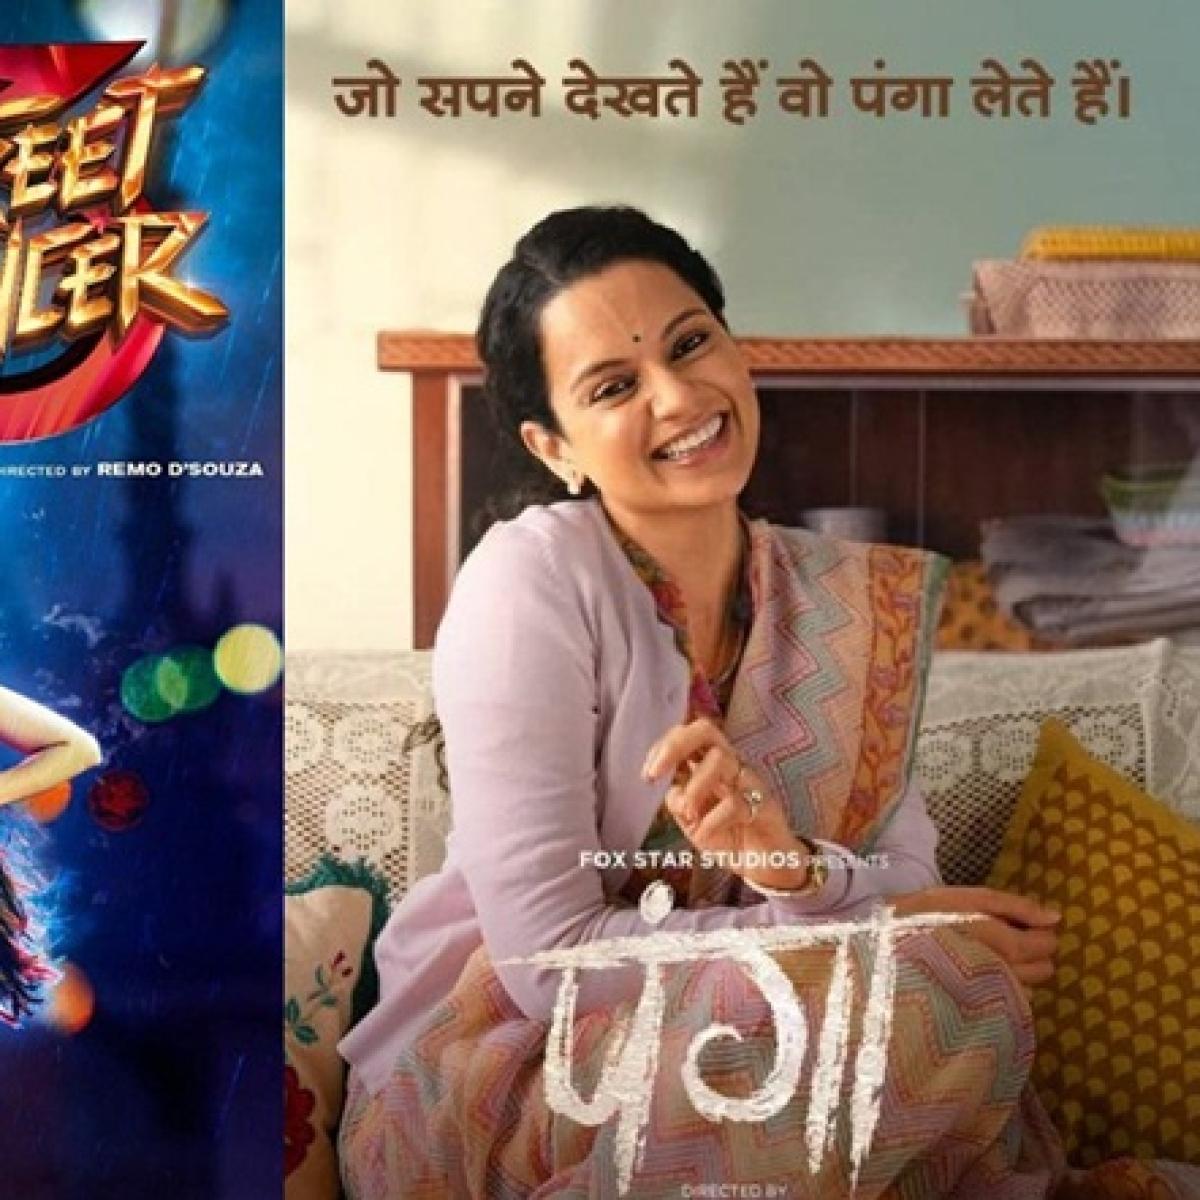 Varun Dhawan's 'Street Dancer 3D' quashes Kangana Ranaut's 'Panga' at the box office